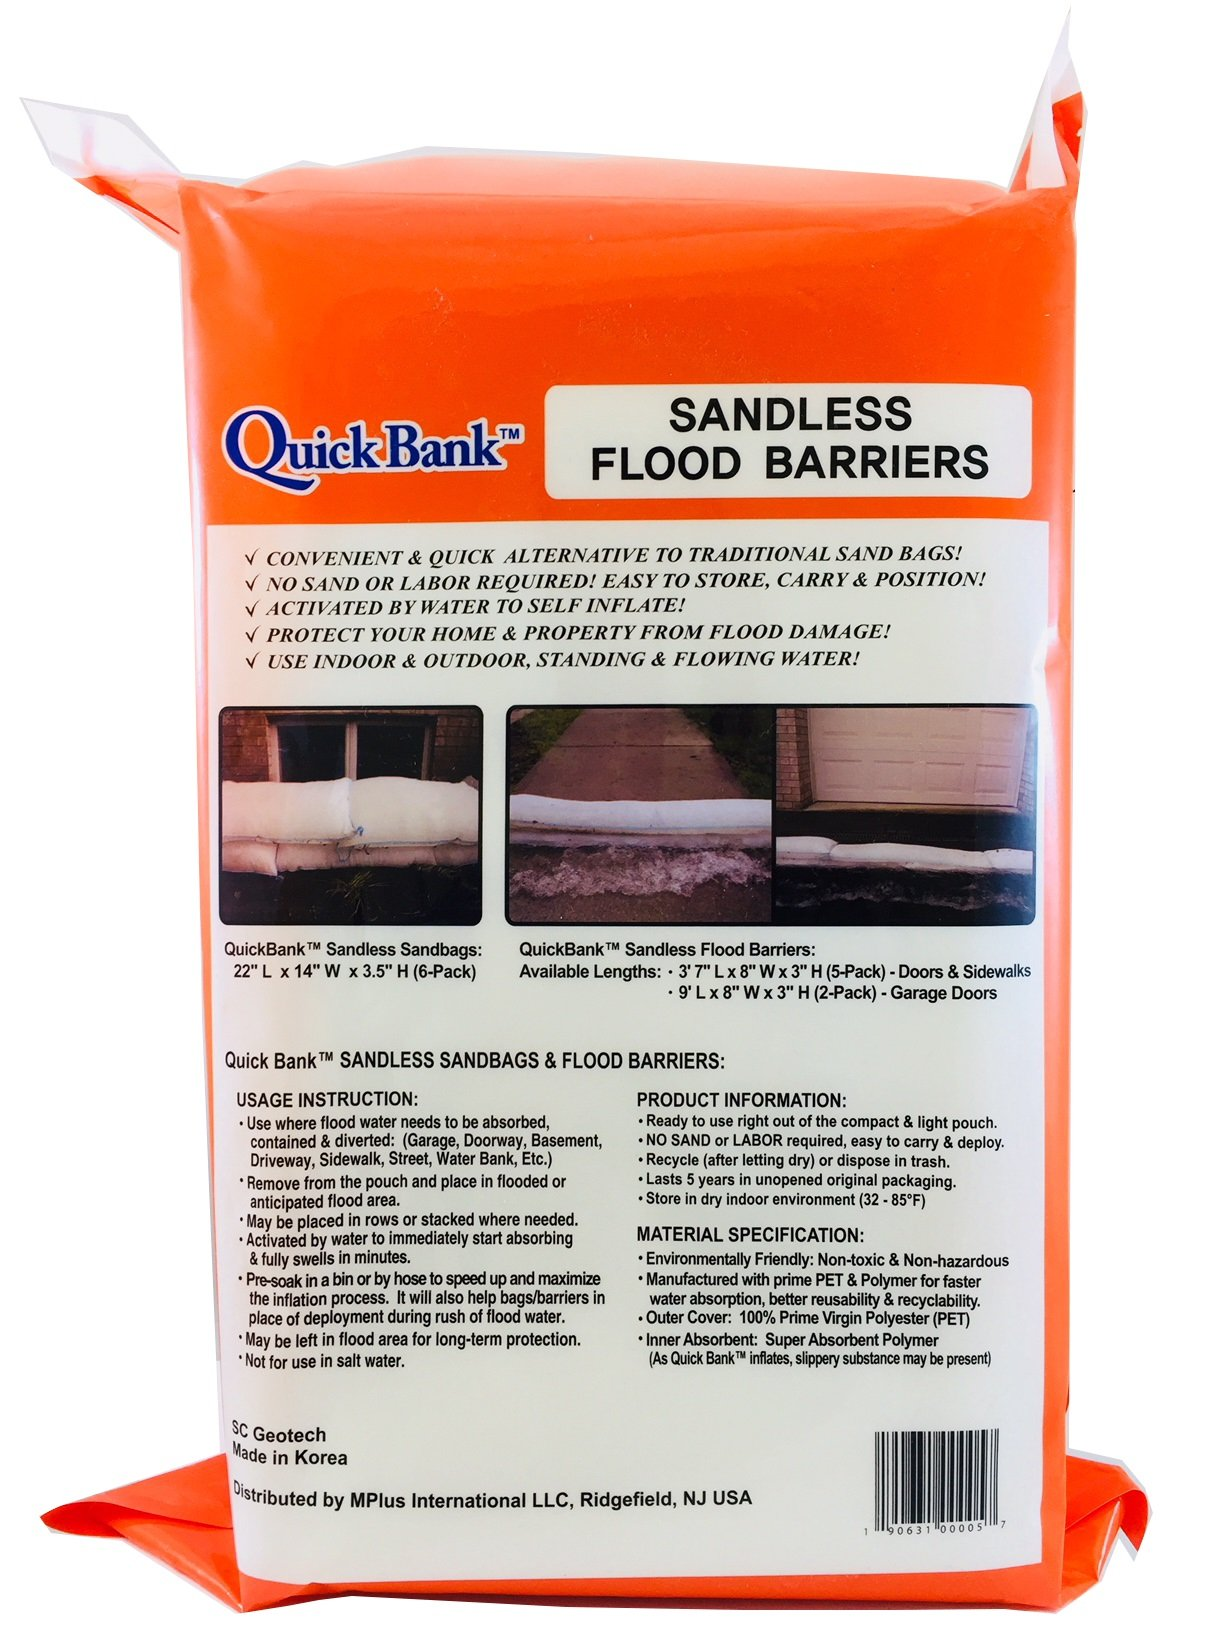 Sandless Flood Barrier - High Capacity, 44 Inch Length, 5-Pack